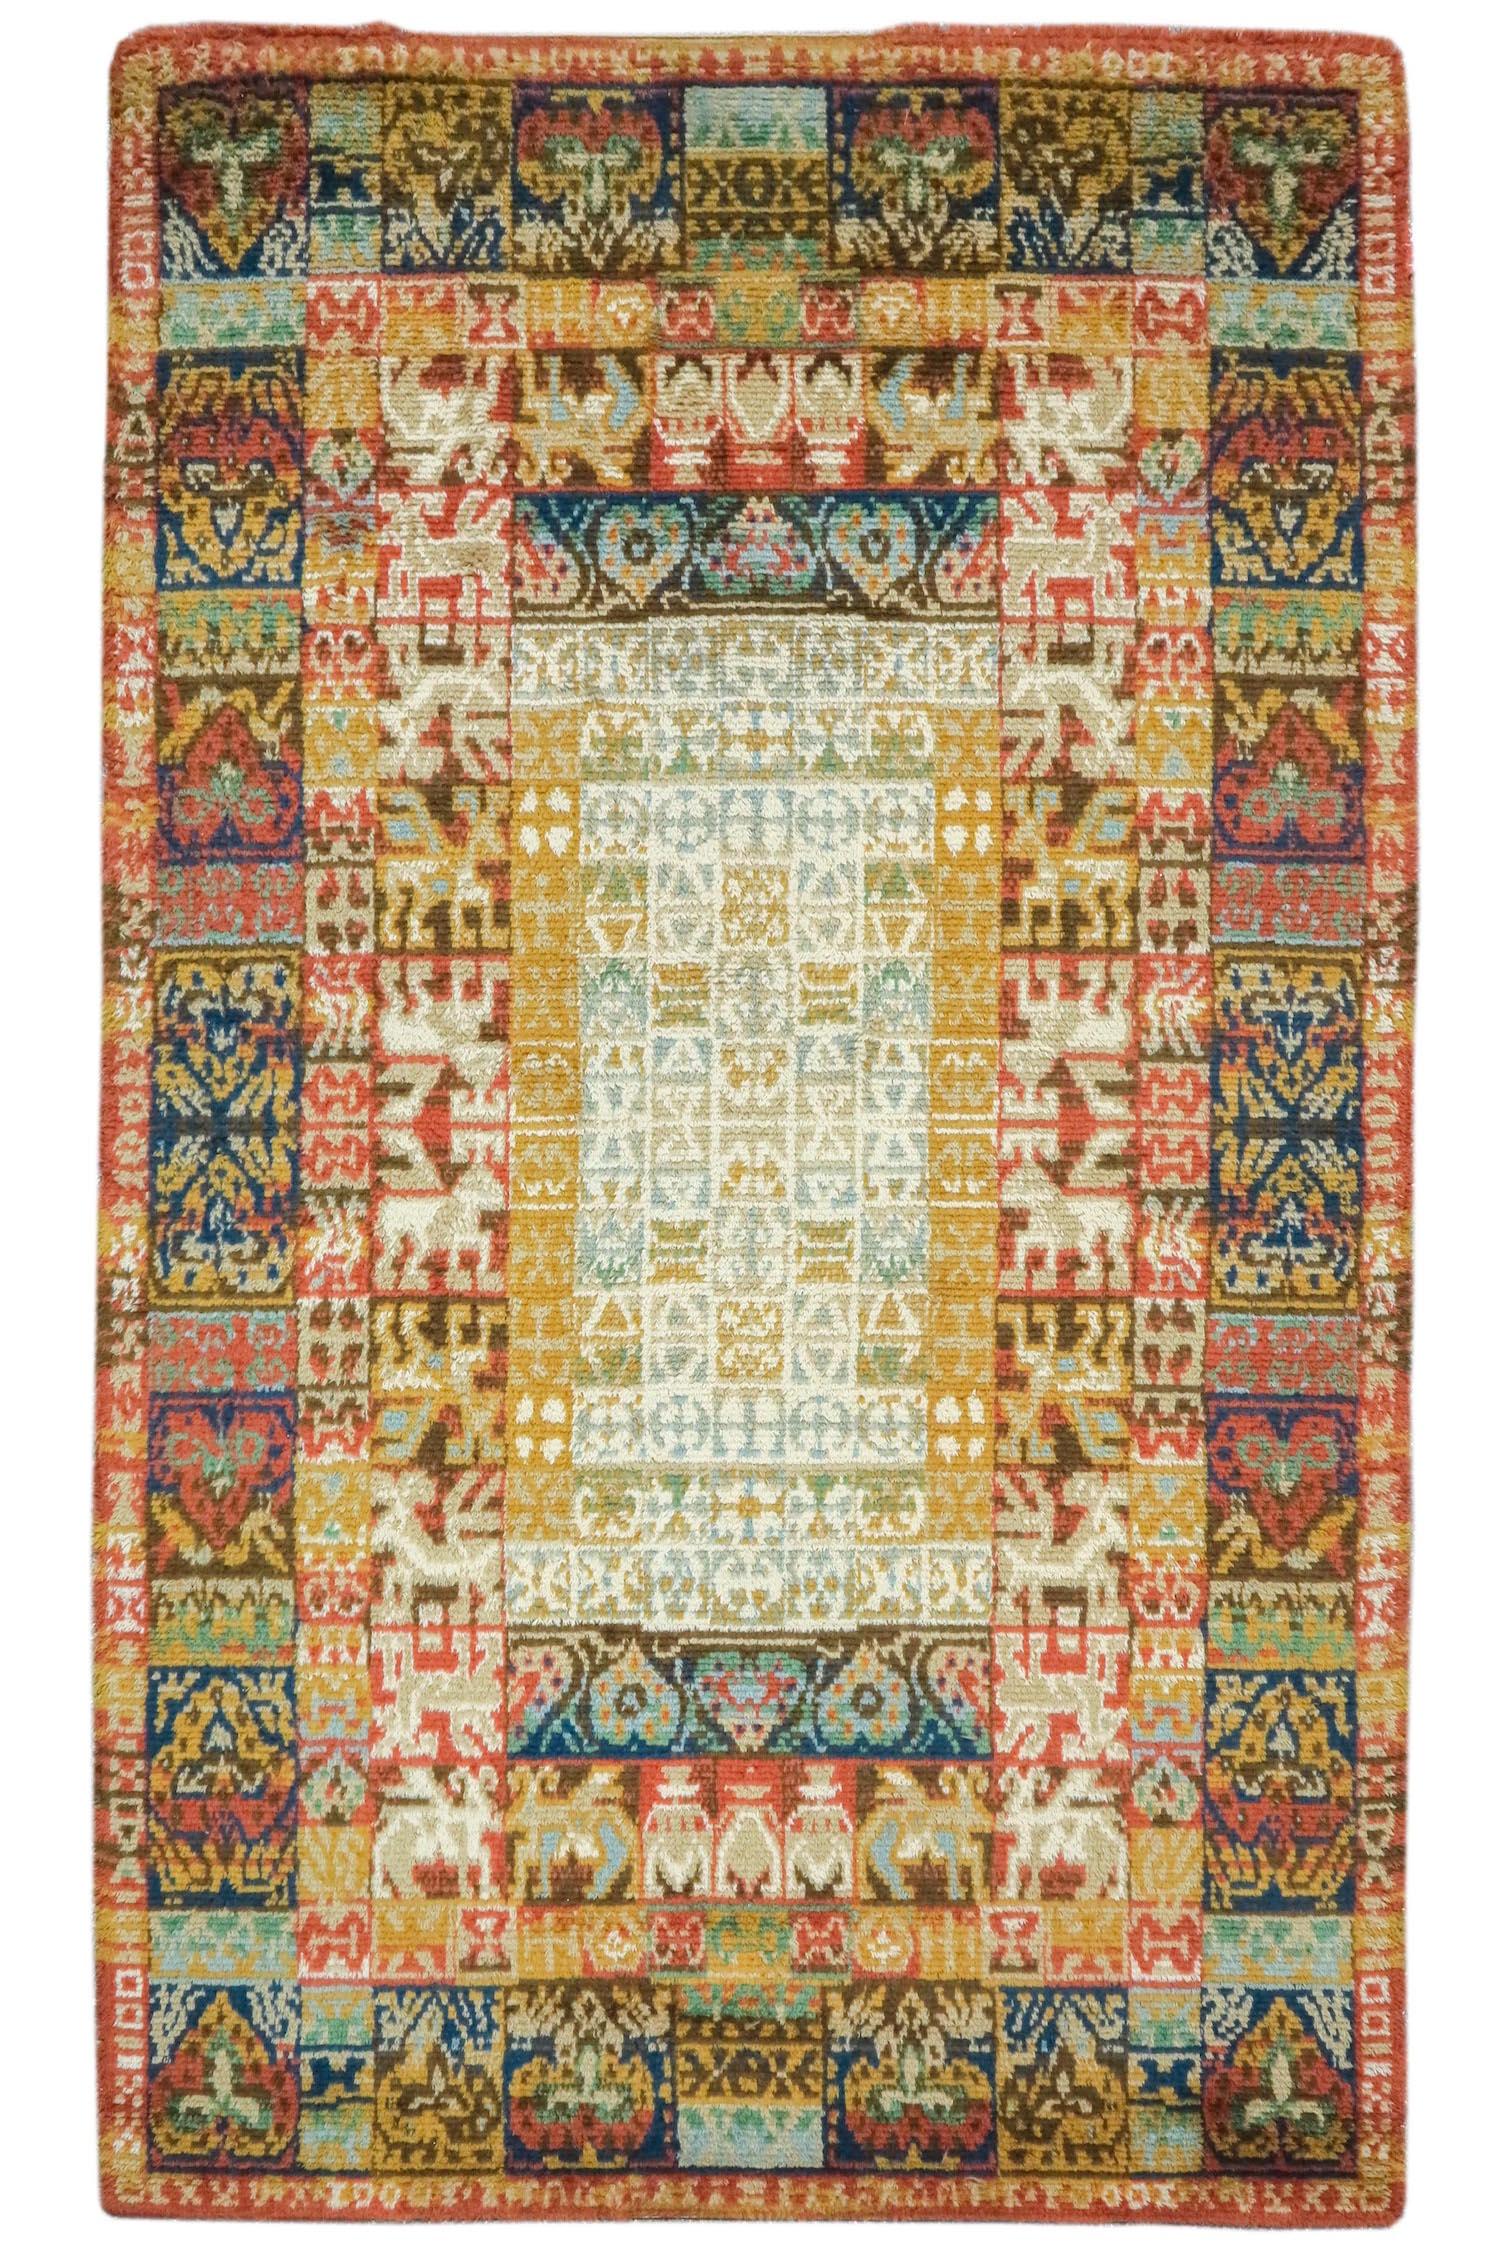 Danish modern rug